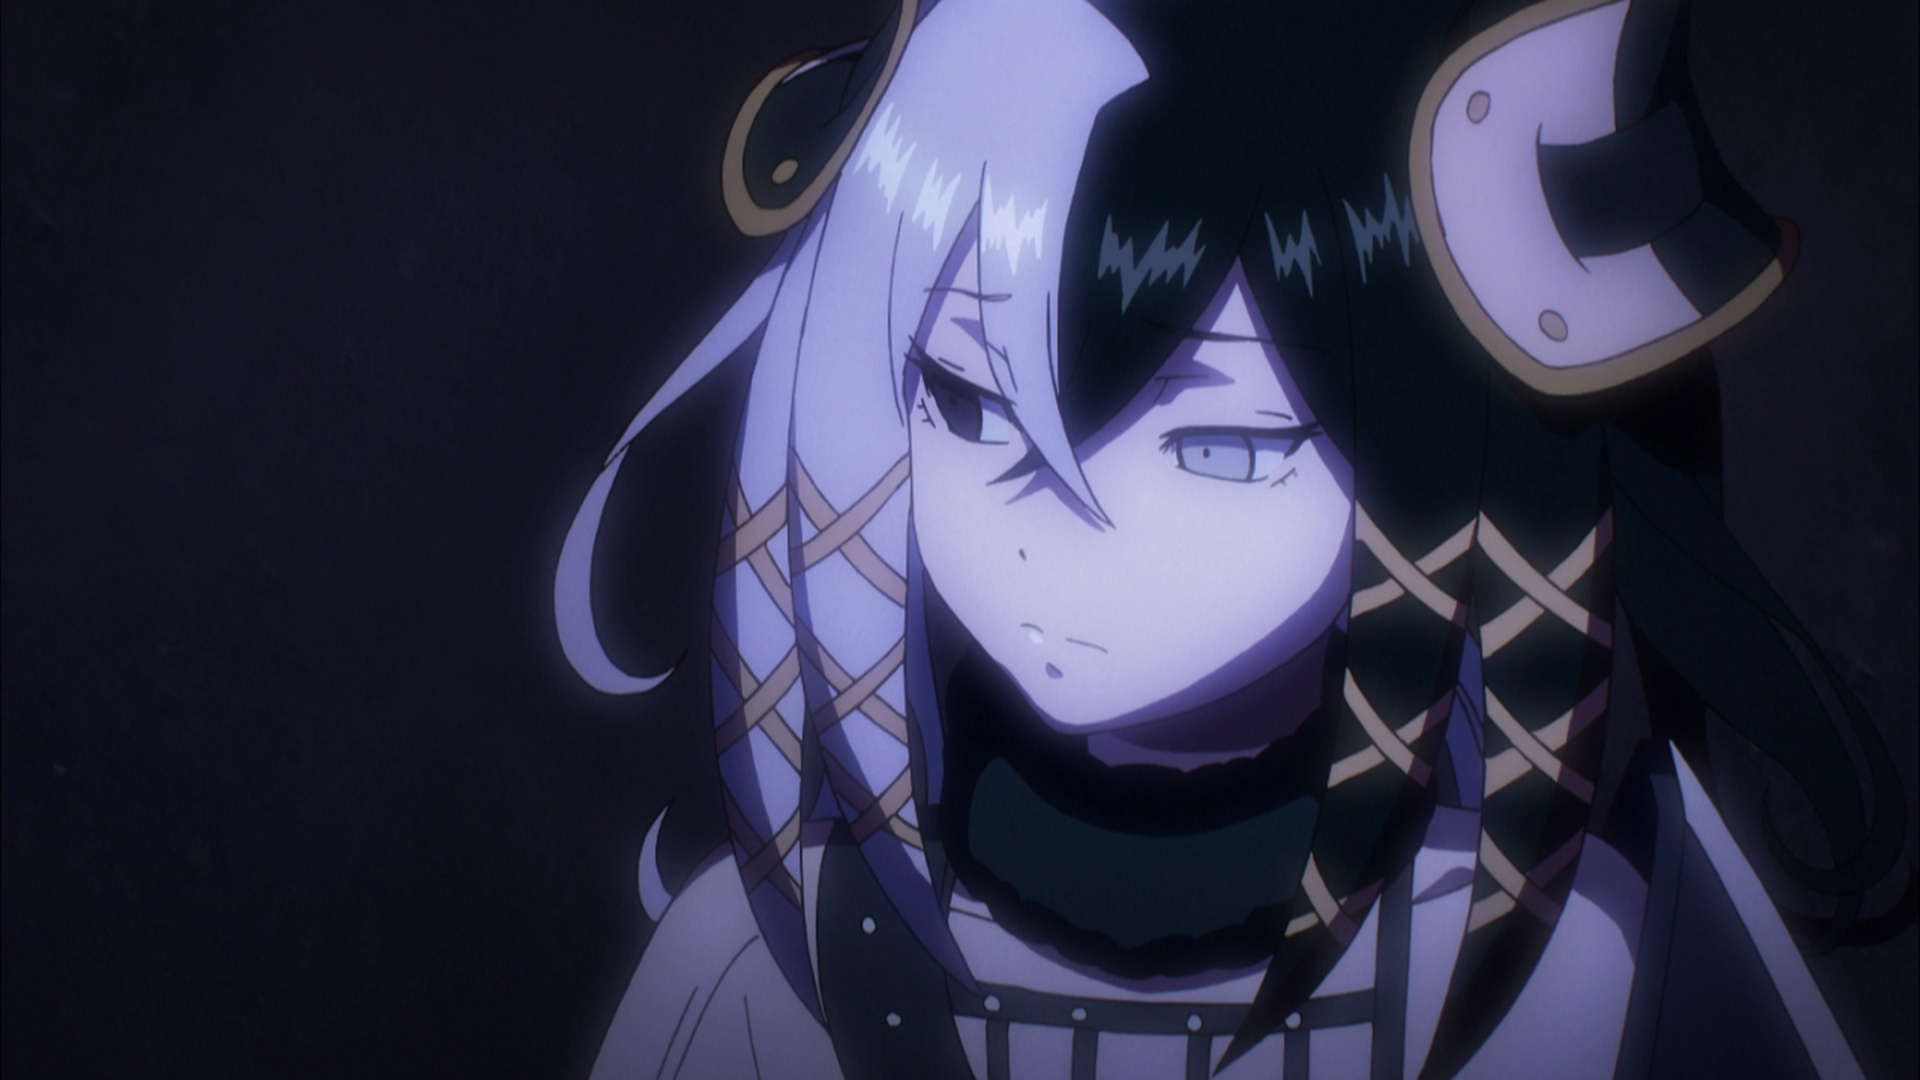 Watch Overlord Season 2 Episode 14 Anime On Funimation